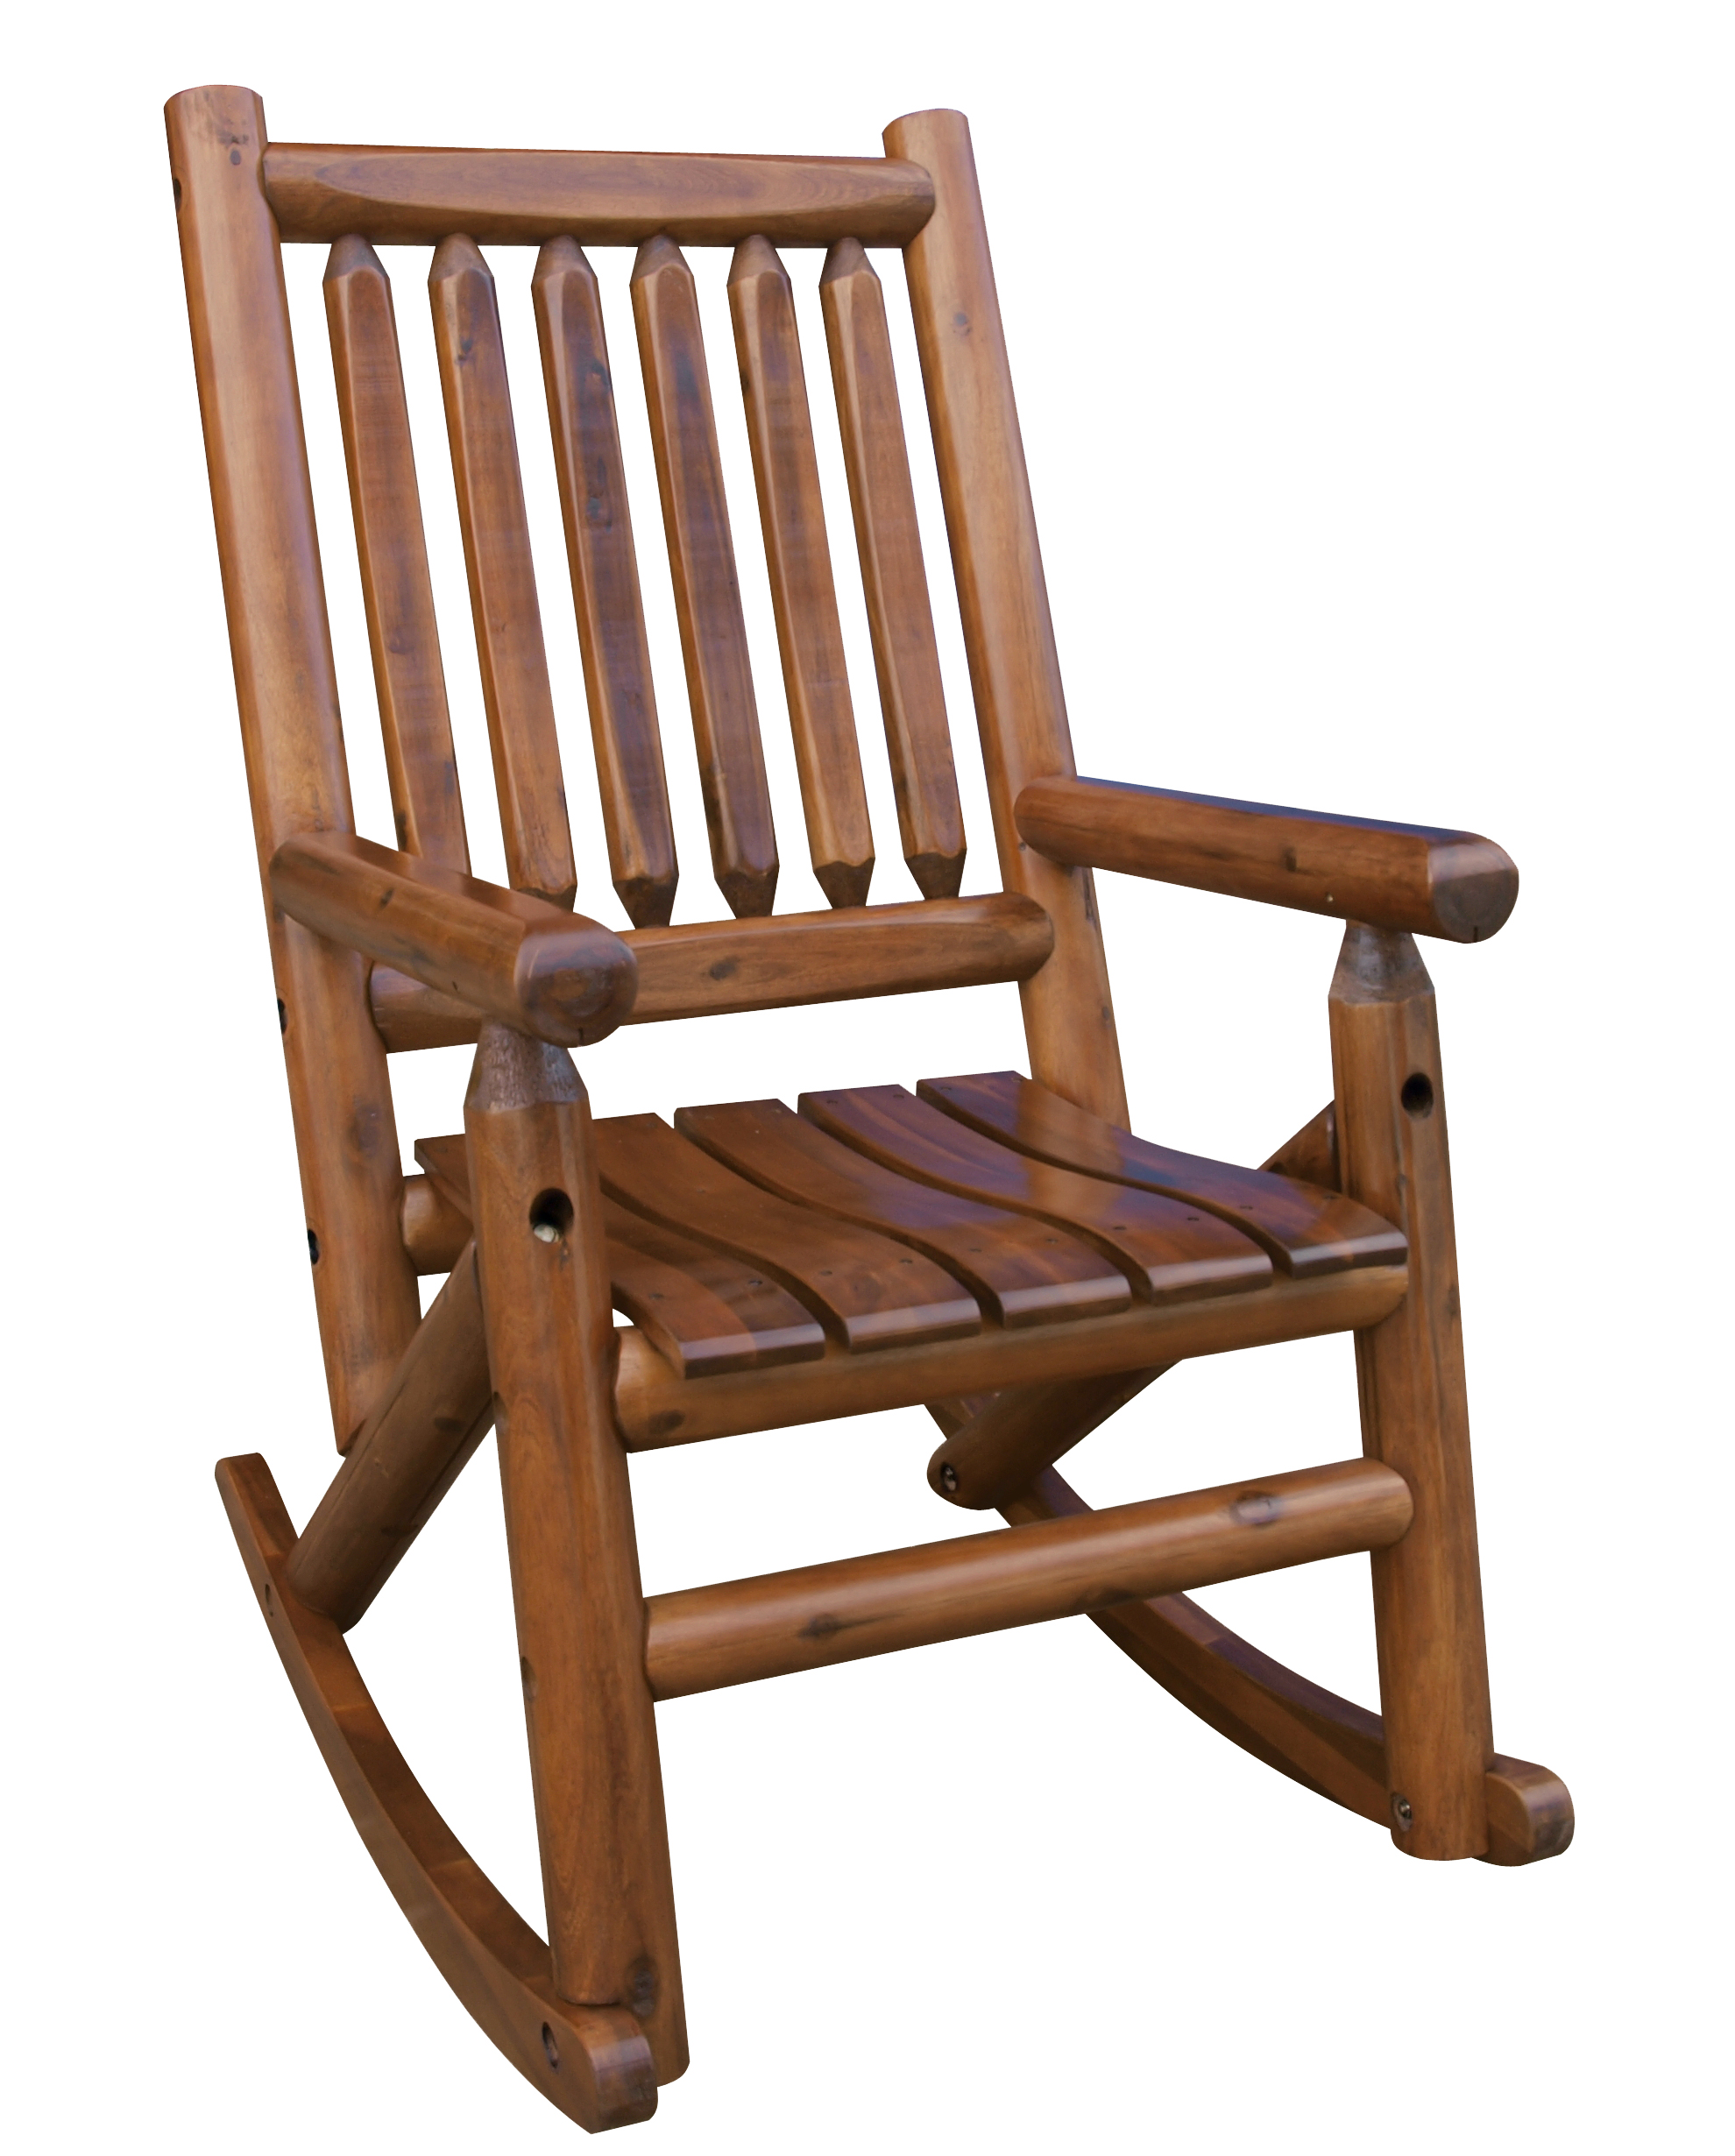 Magnificent Murdochs Leigh Country Amber Log Porch Rocker Machost Co Dining Chair Design Ideas Machostcouk